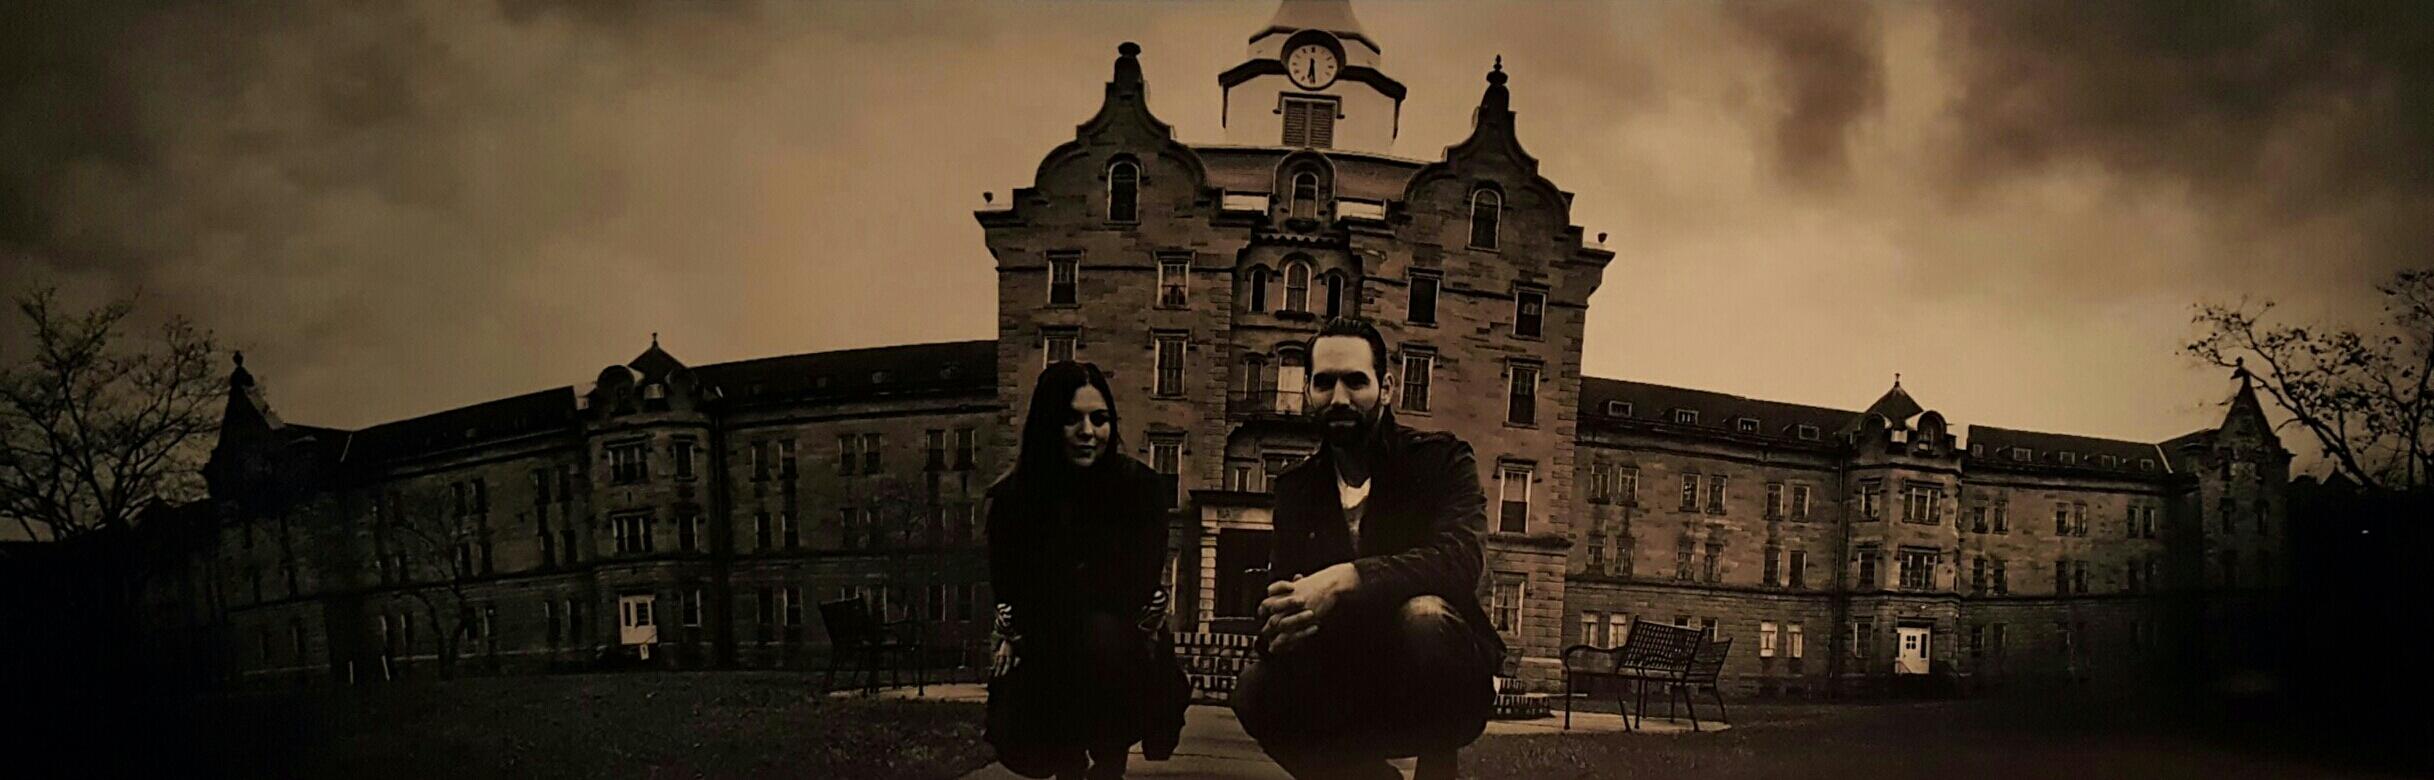 Paranormal Lockdown Premiere Trans Allegheny Lunatic Asylum From